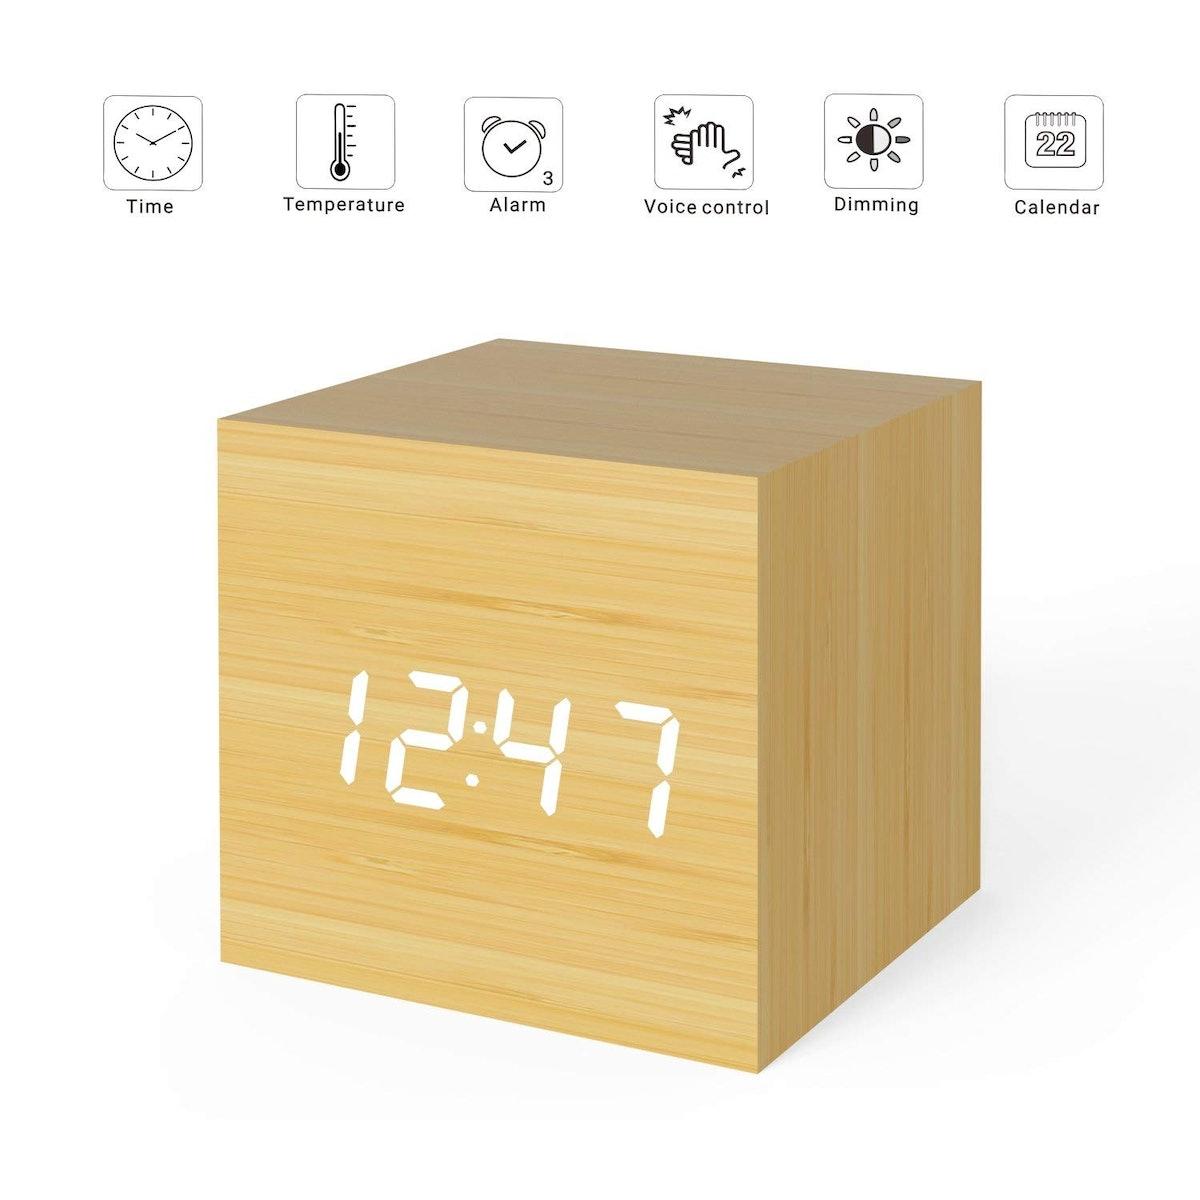 MiCar Digital Alarm Clock